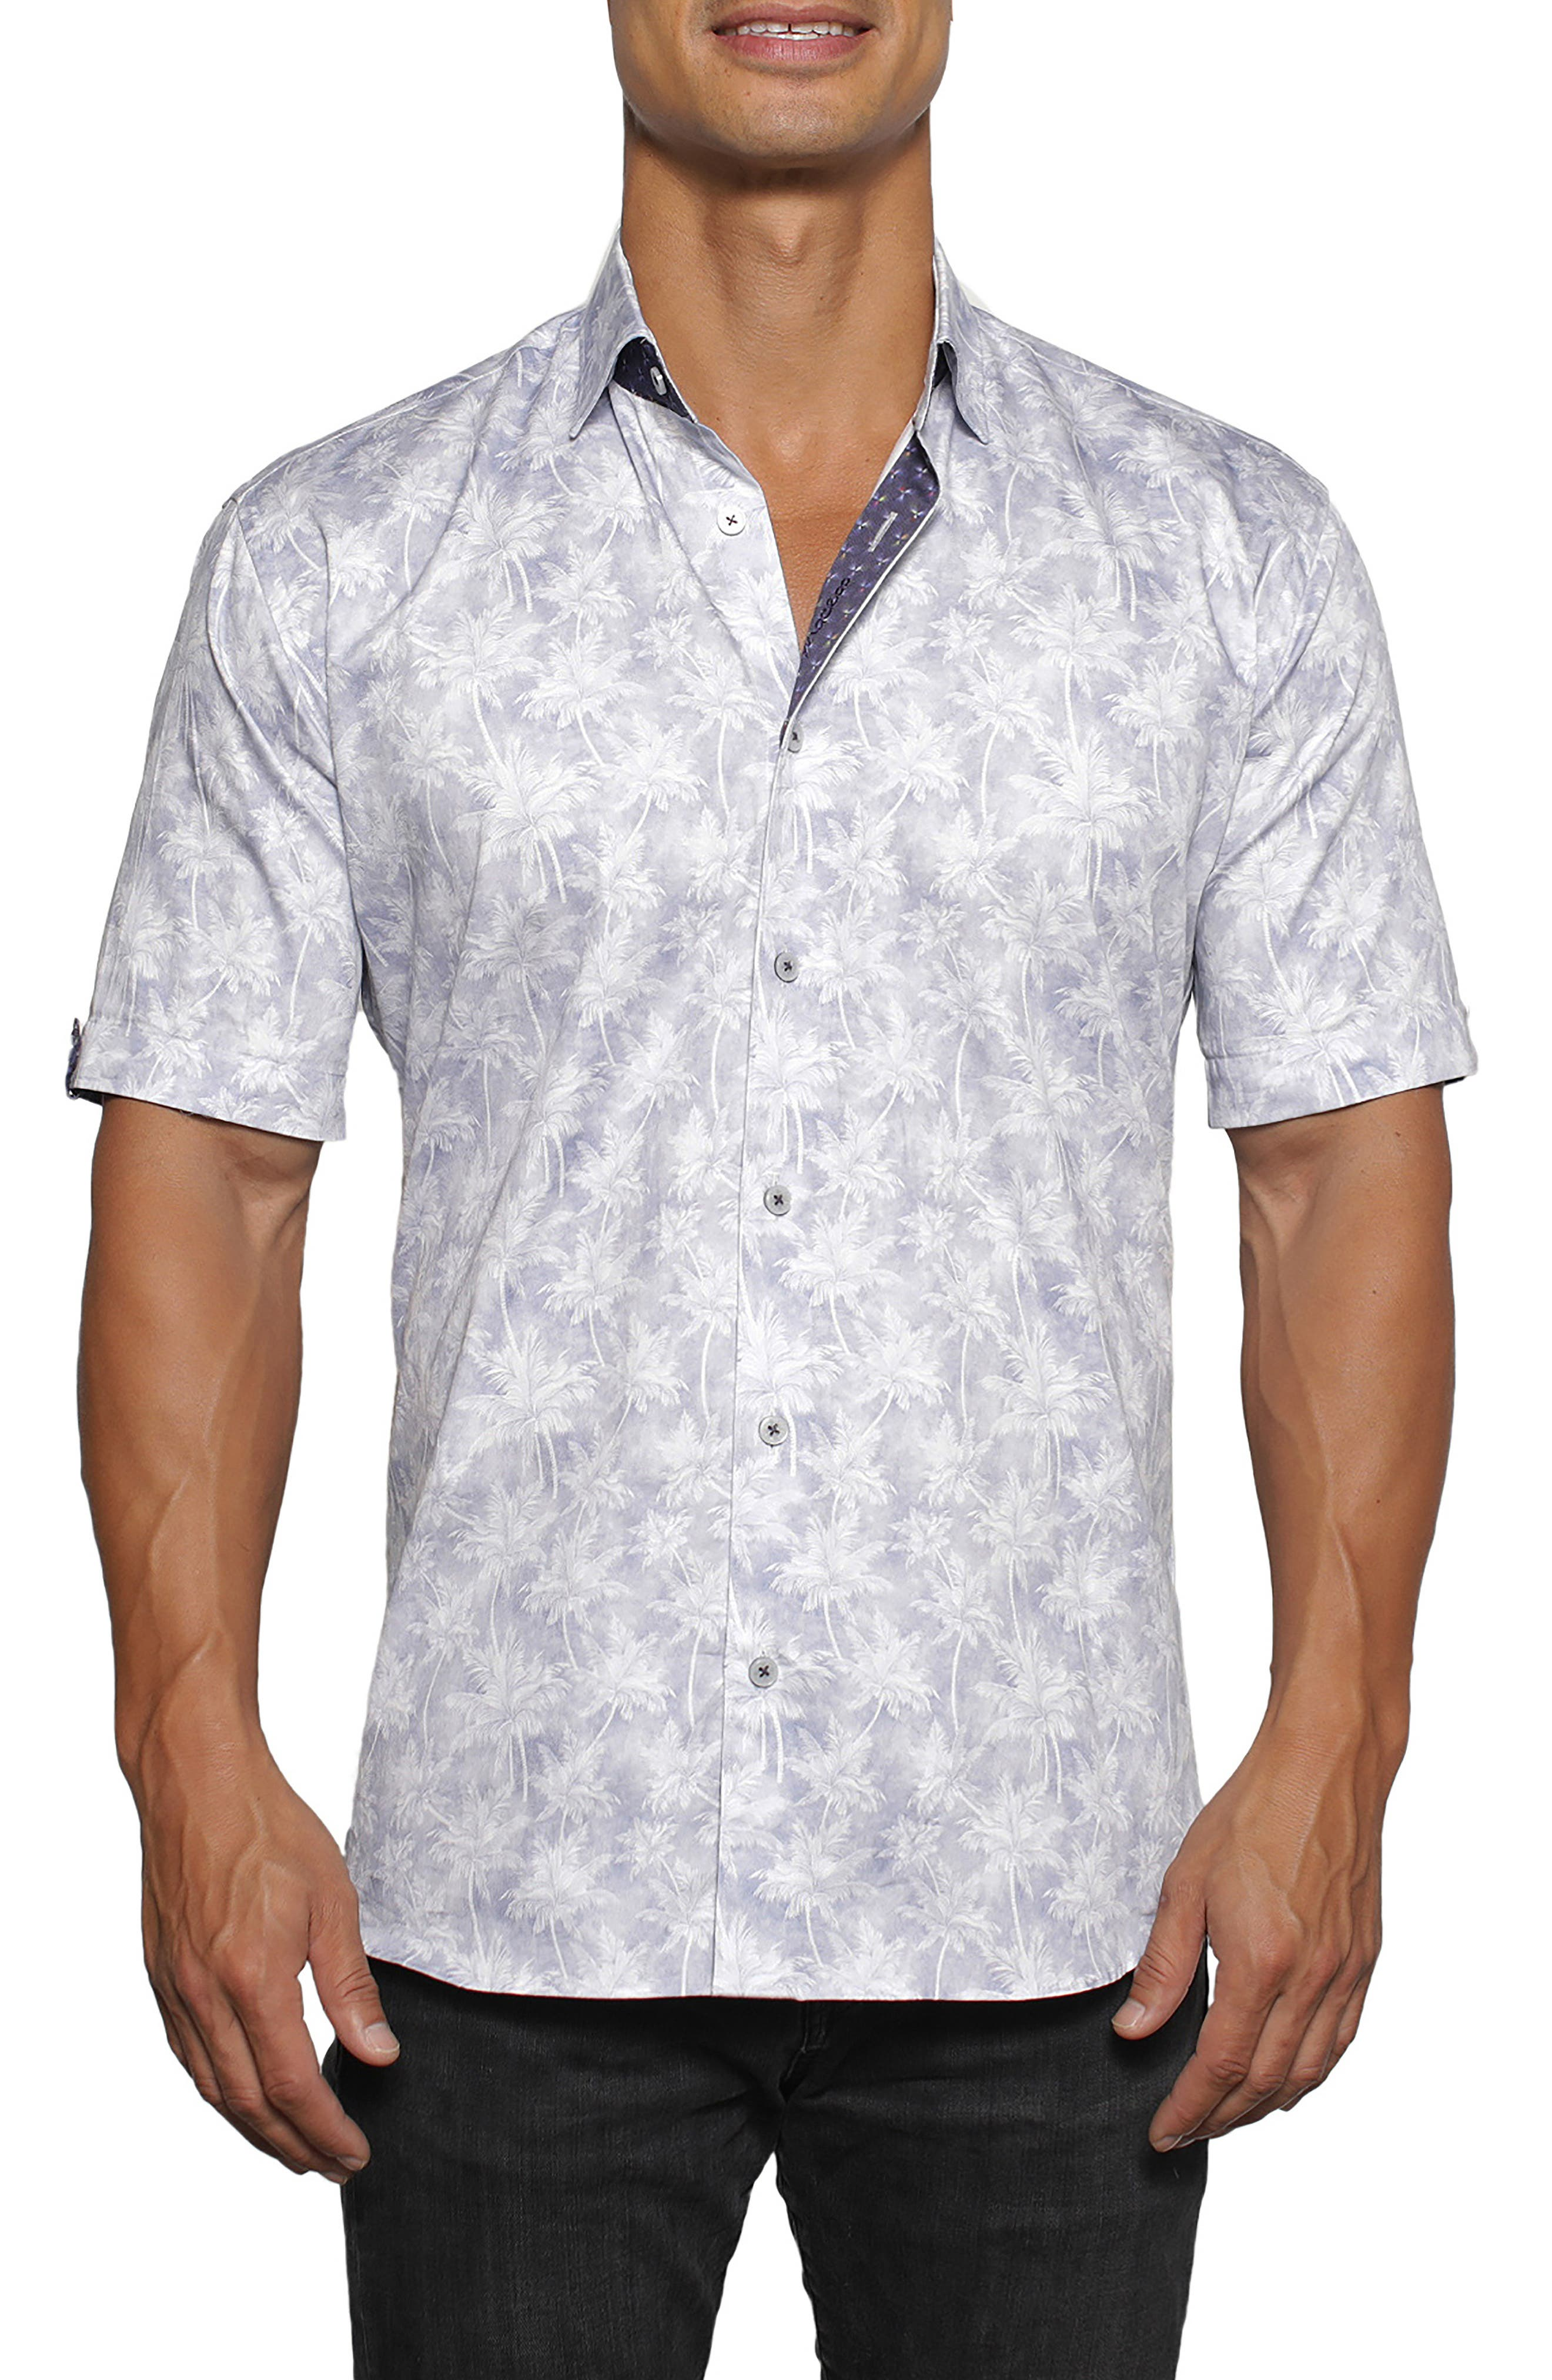 Galileo Hawaii Regular Fit Short Sleeve Button-Up Shirt